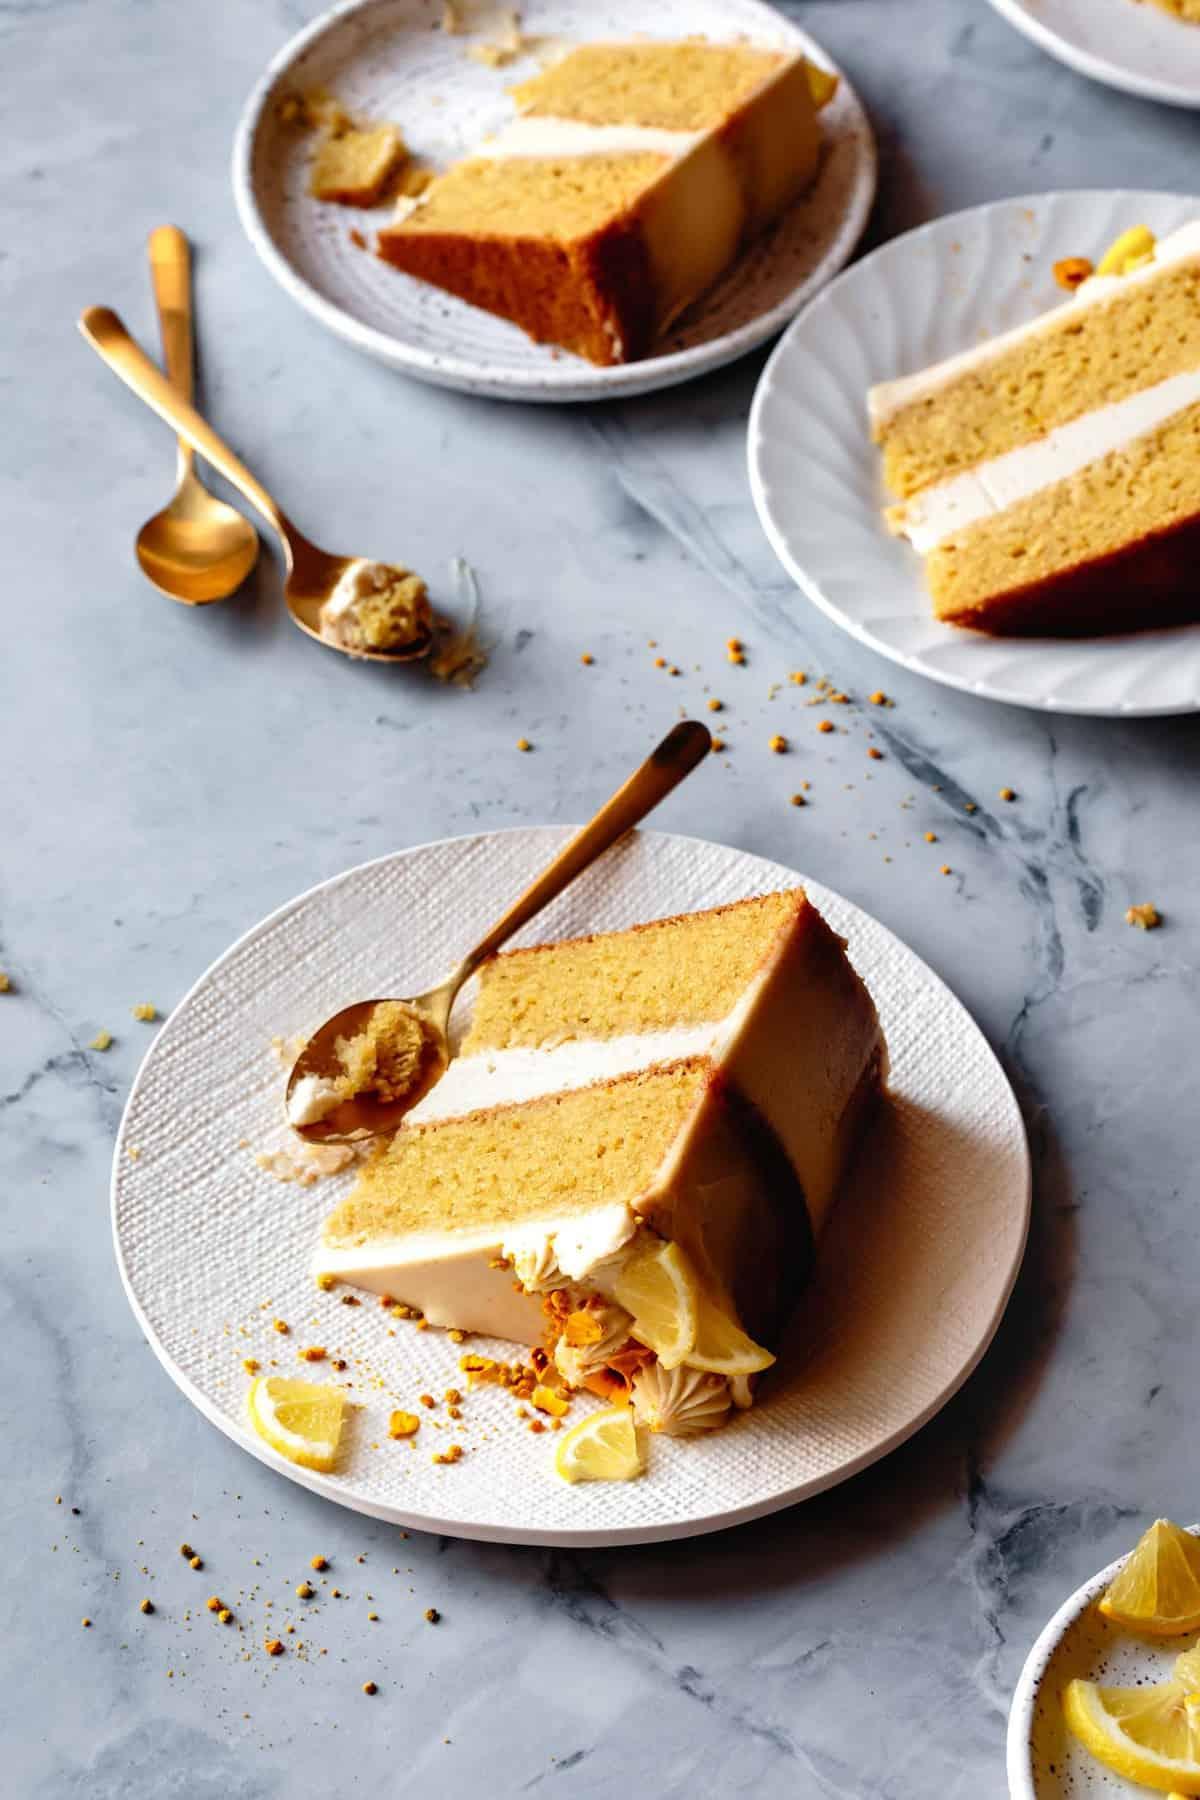 slices of paleo lemon cake on white ceramic plates